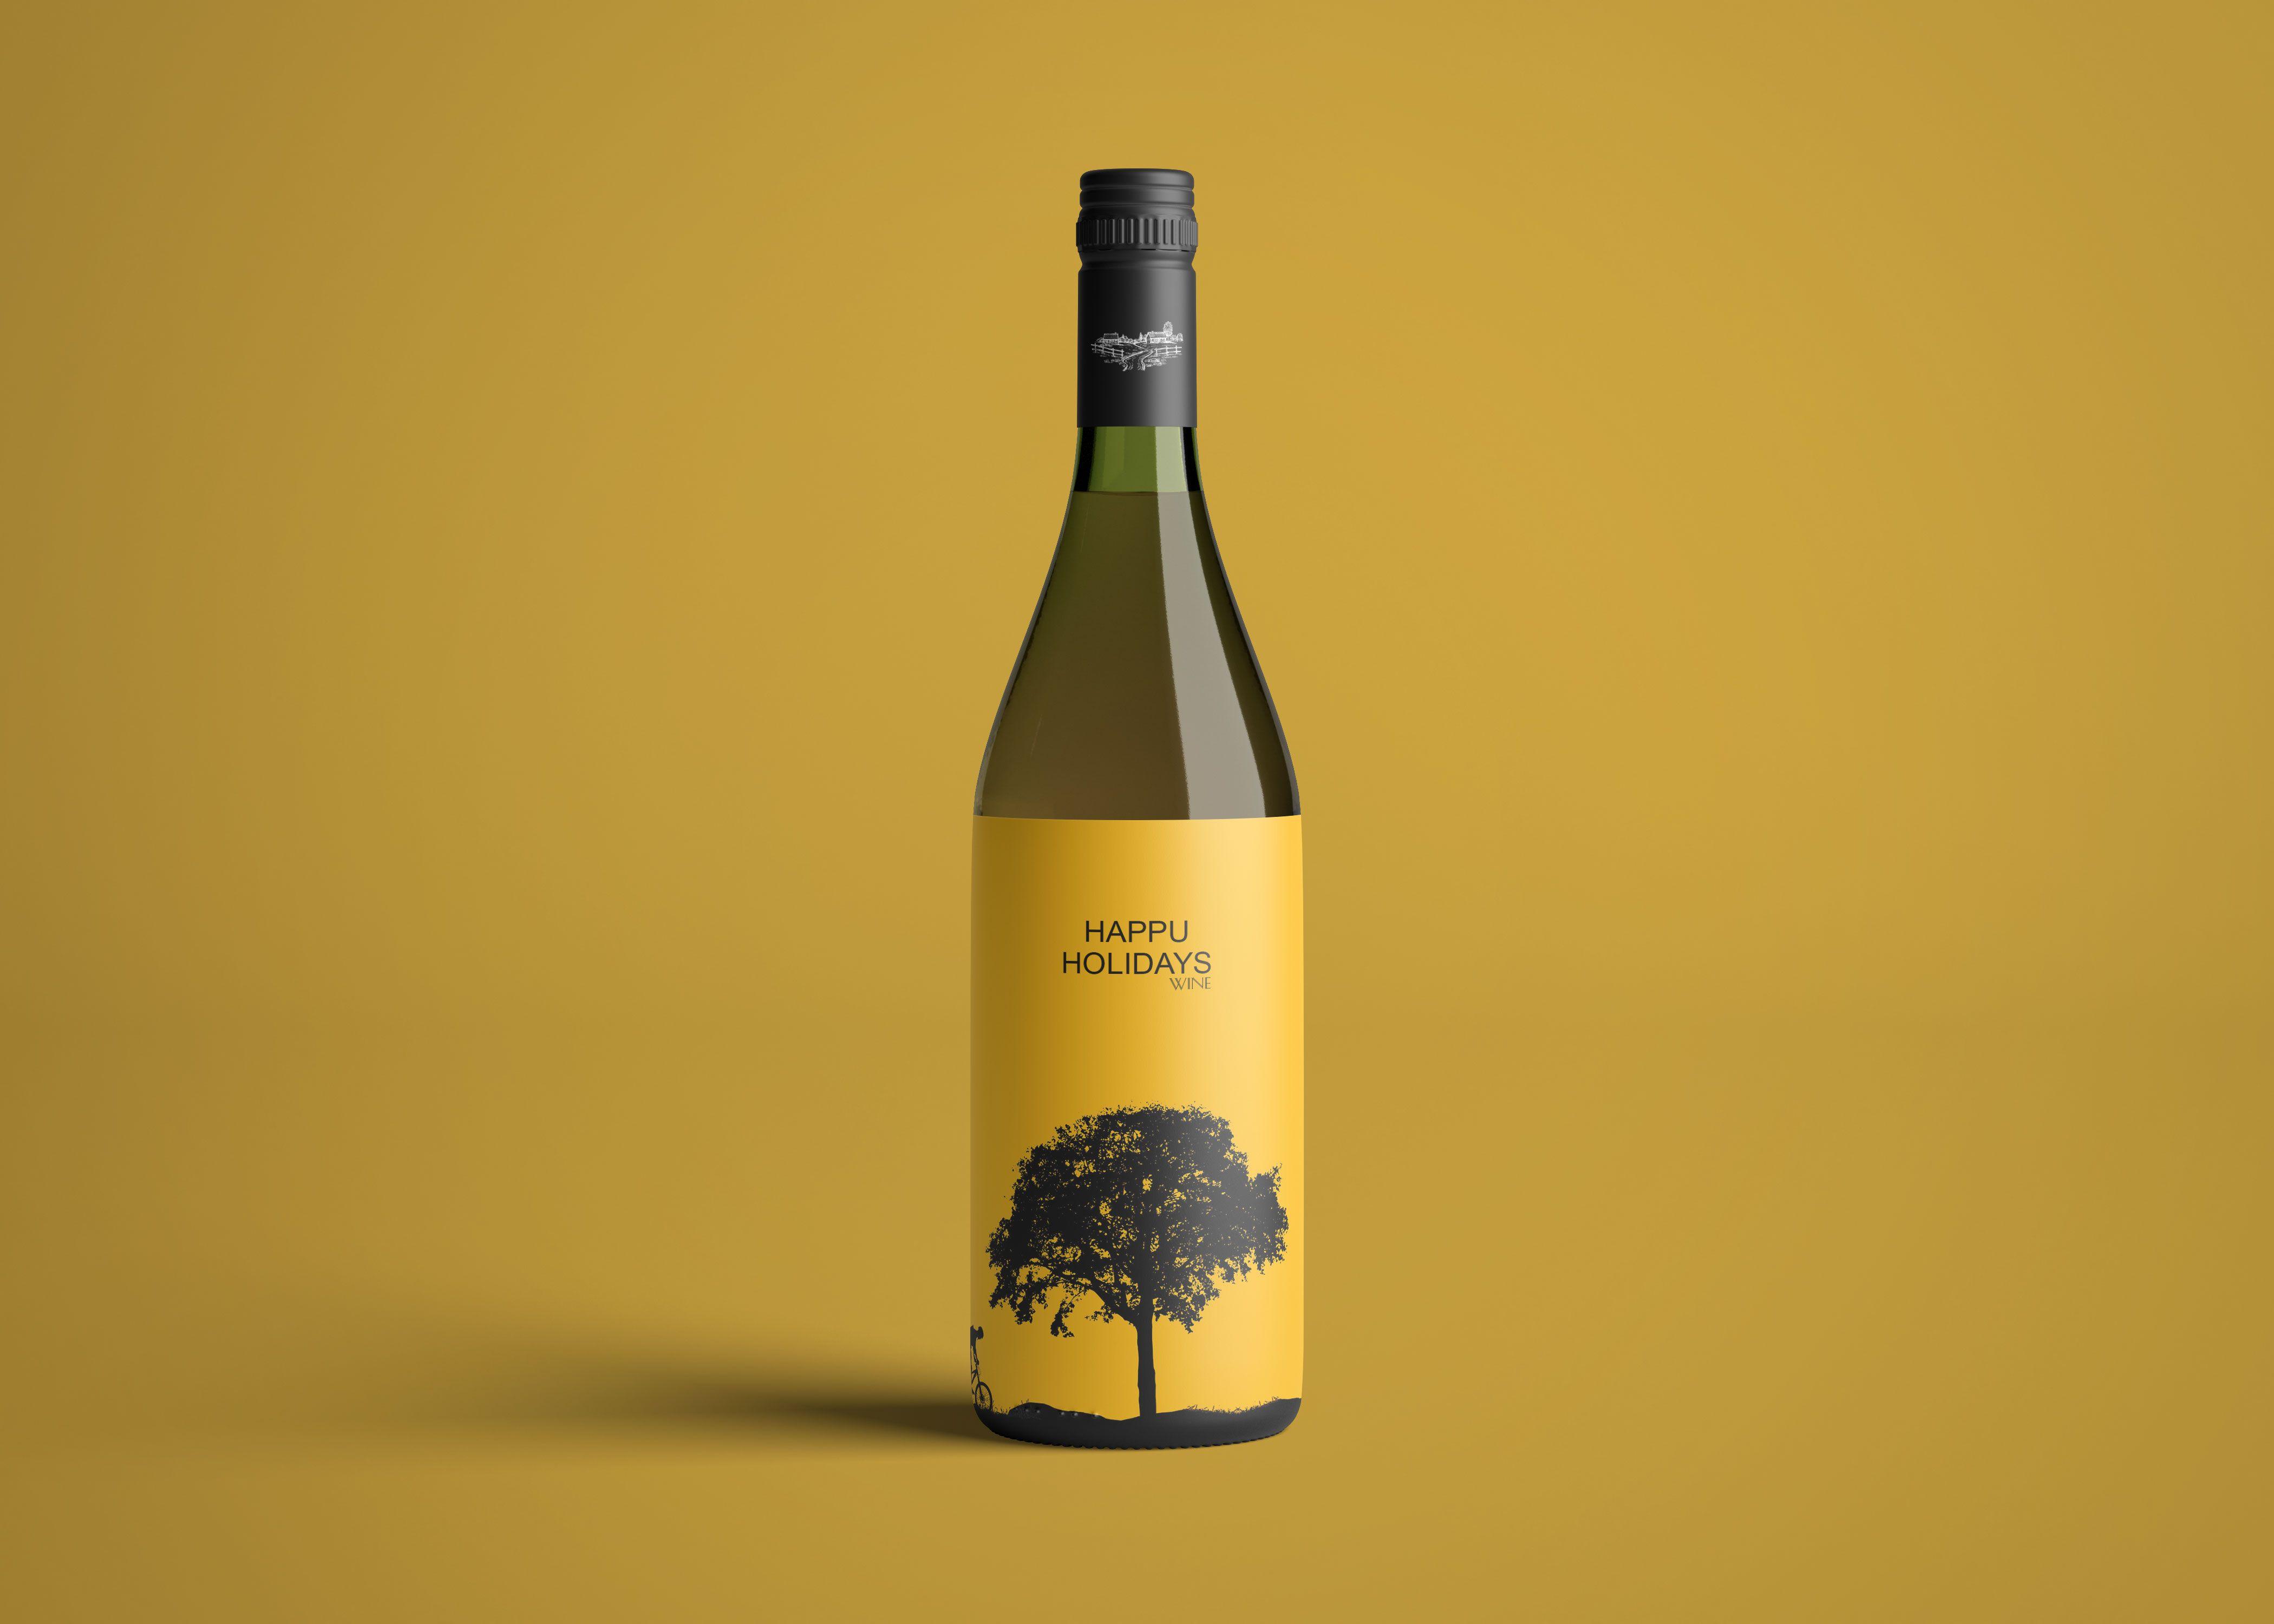 Premium Wine Bottle Label Mockup 2019 Bottle Mockup Logo Design Mockup Wine Bottle Labels